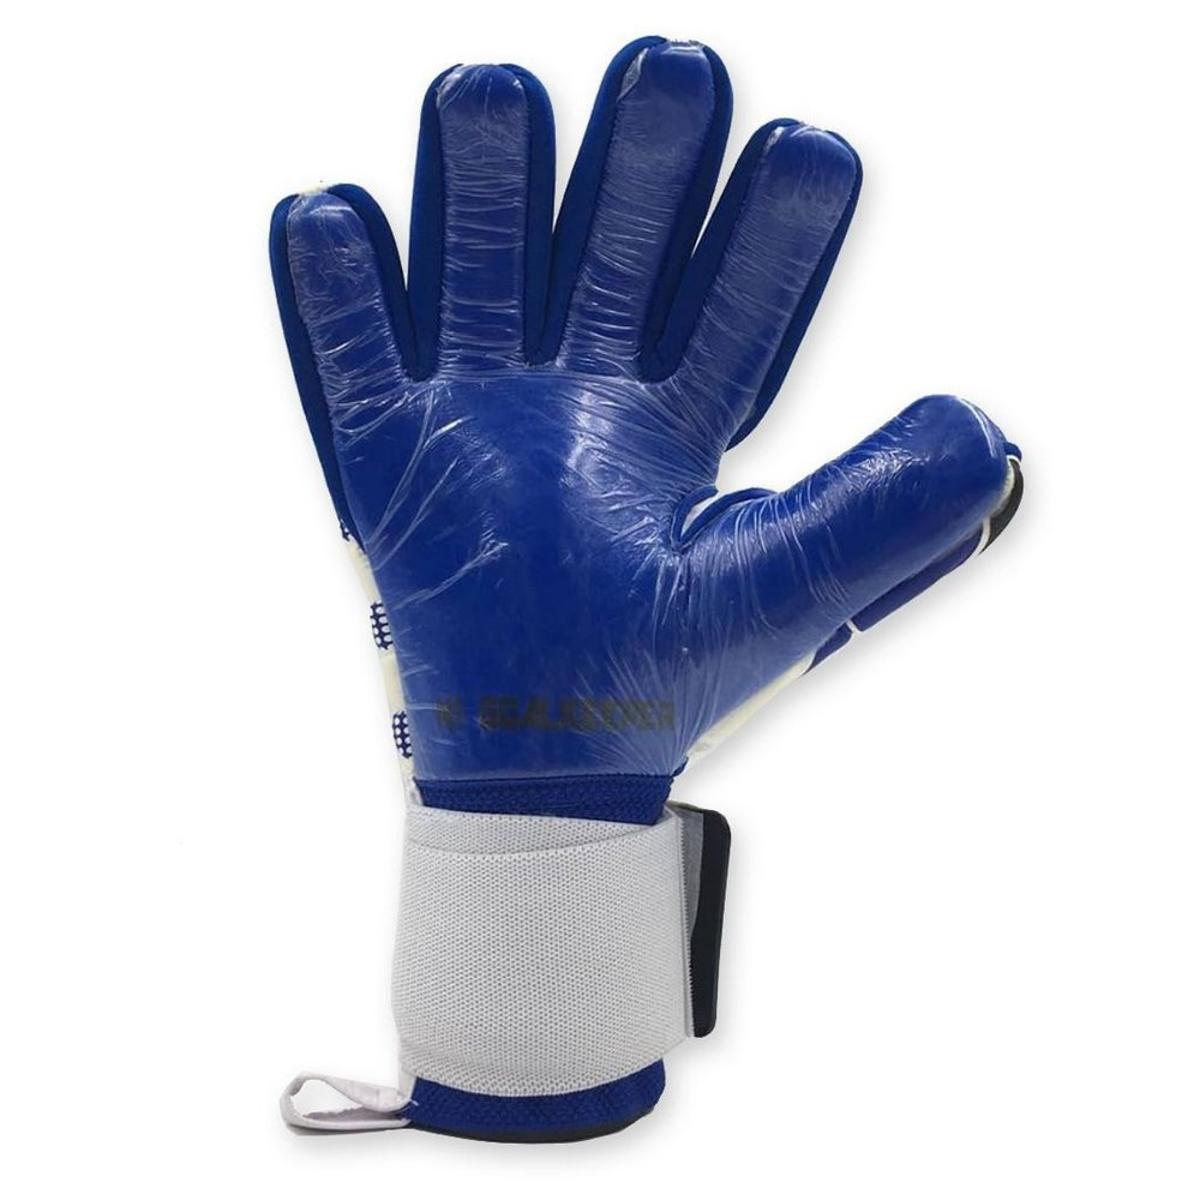 LUVAS DE GOLEIRO N1 HORUS ELITE BLUE